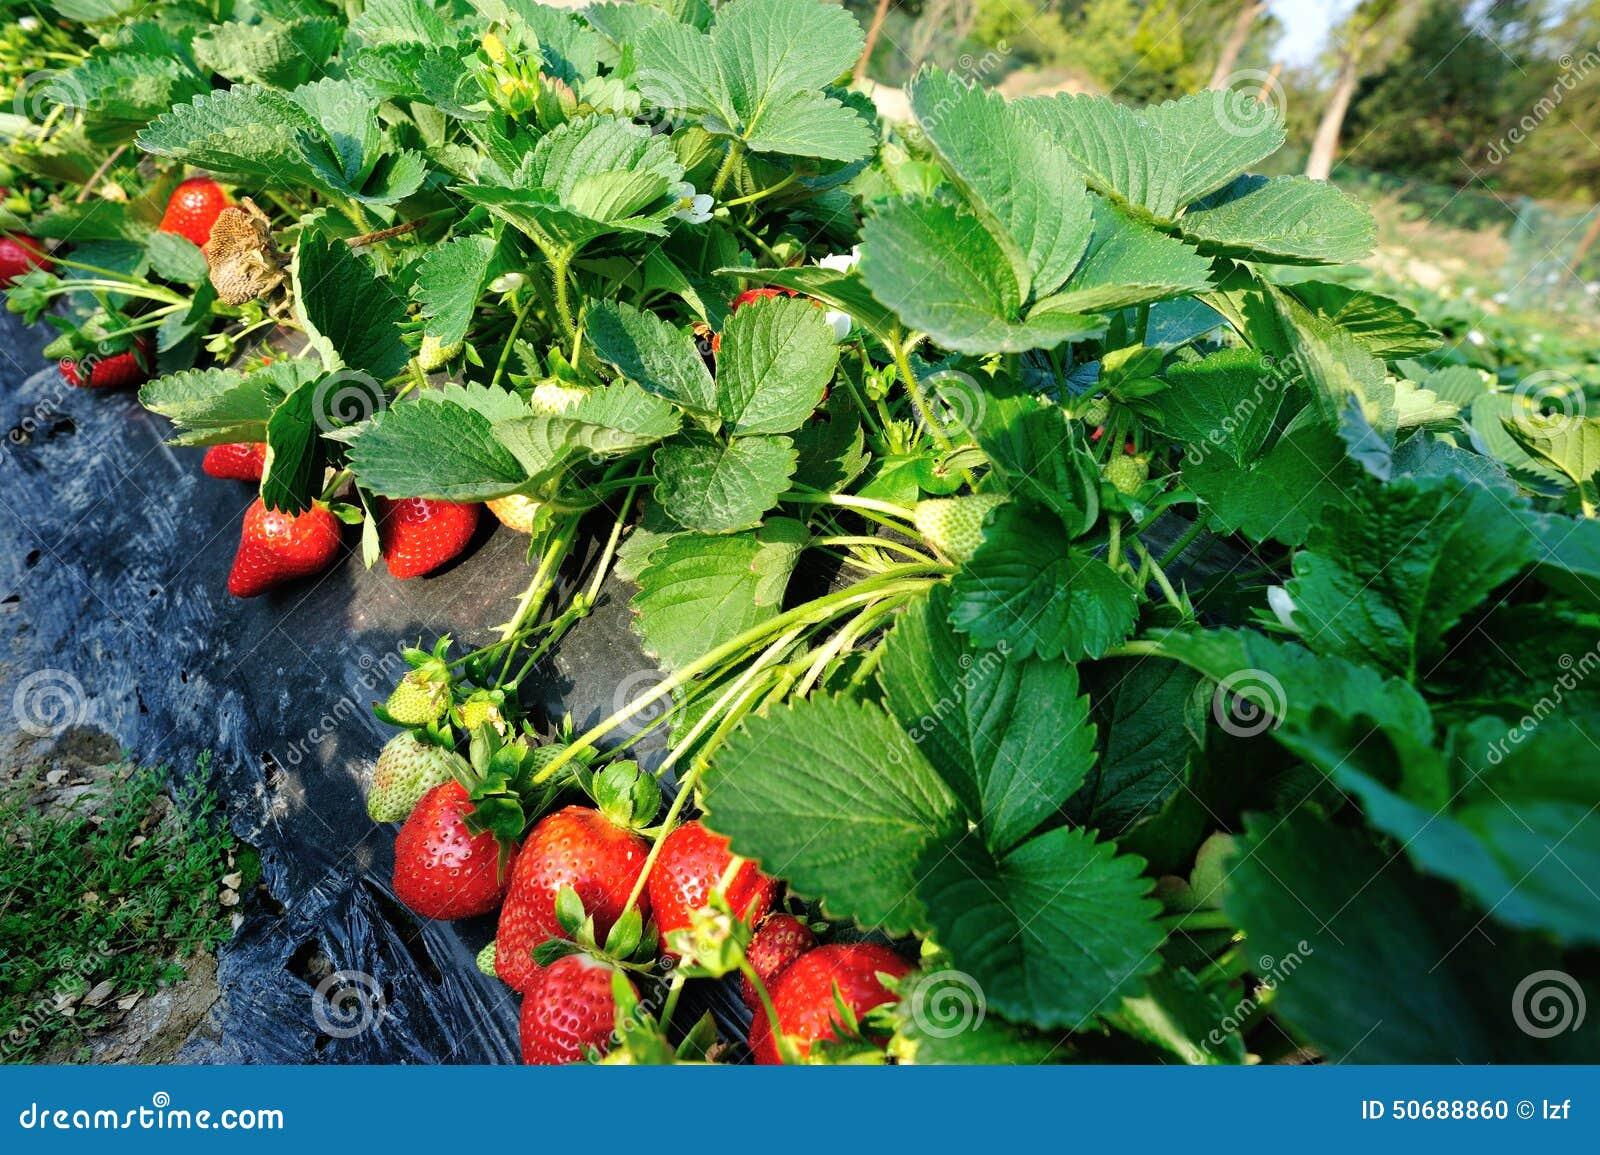 Download 红色草莓果子 库存照片. 图片 包括有 天空, 醉汉, 空白, 叶子, 工厂, 蓝色, 草莓, 空间, 没人 - 50688860